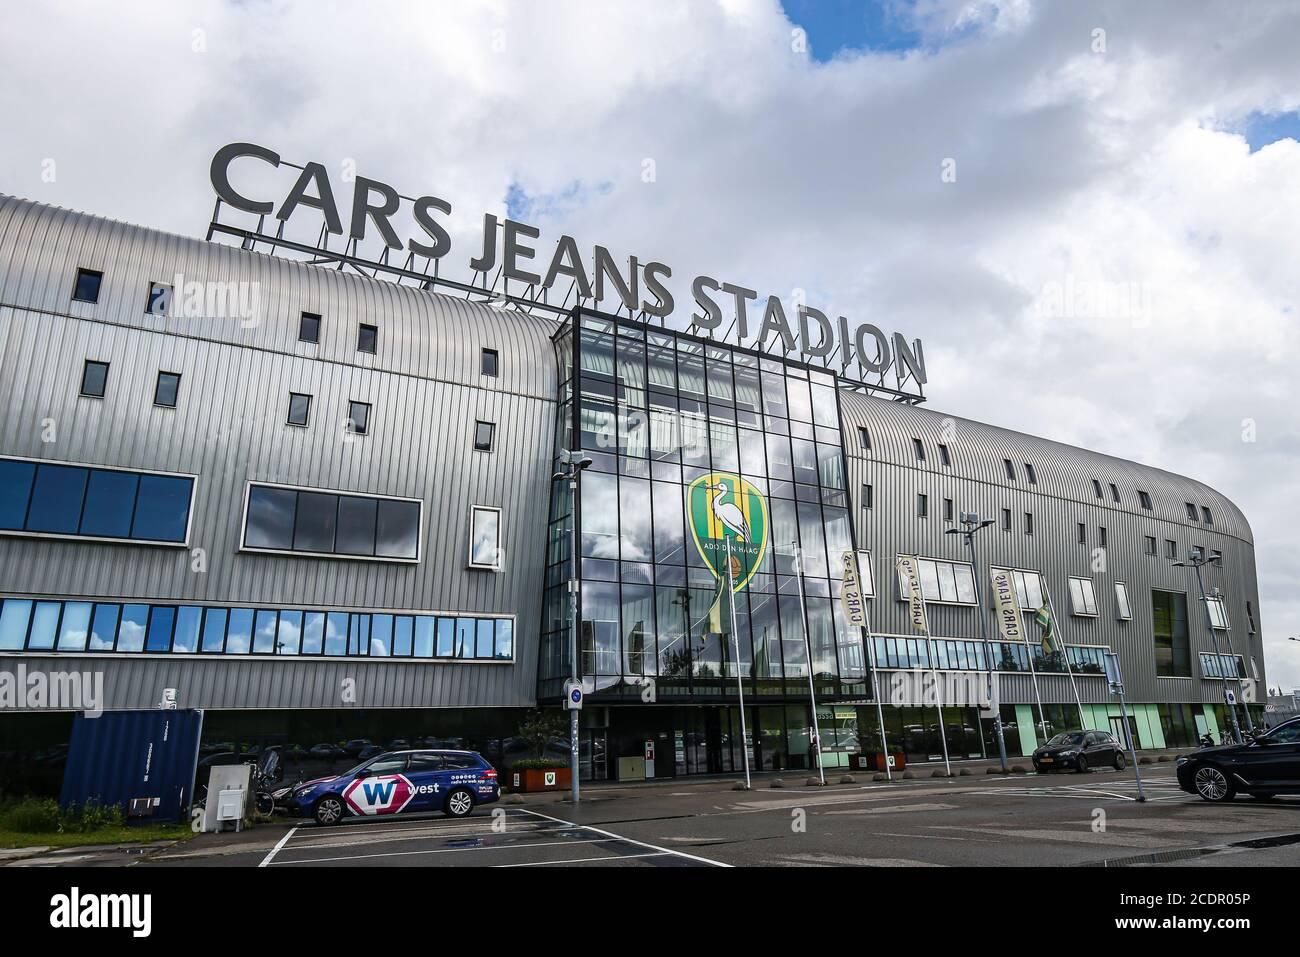 Rotterdam 29 8 20 Cars Jeans Stadion Pre Season 20 21 Ado Den Haag Az Credit Pro Shots Alamy Live News Stock Photo Alamy